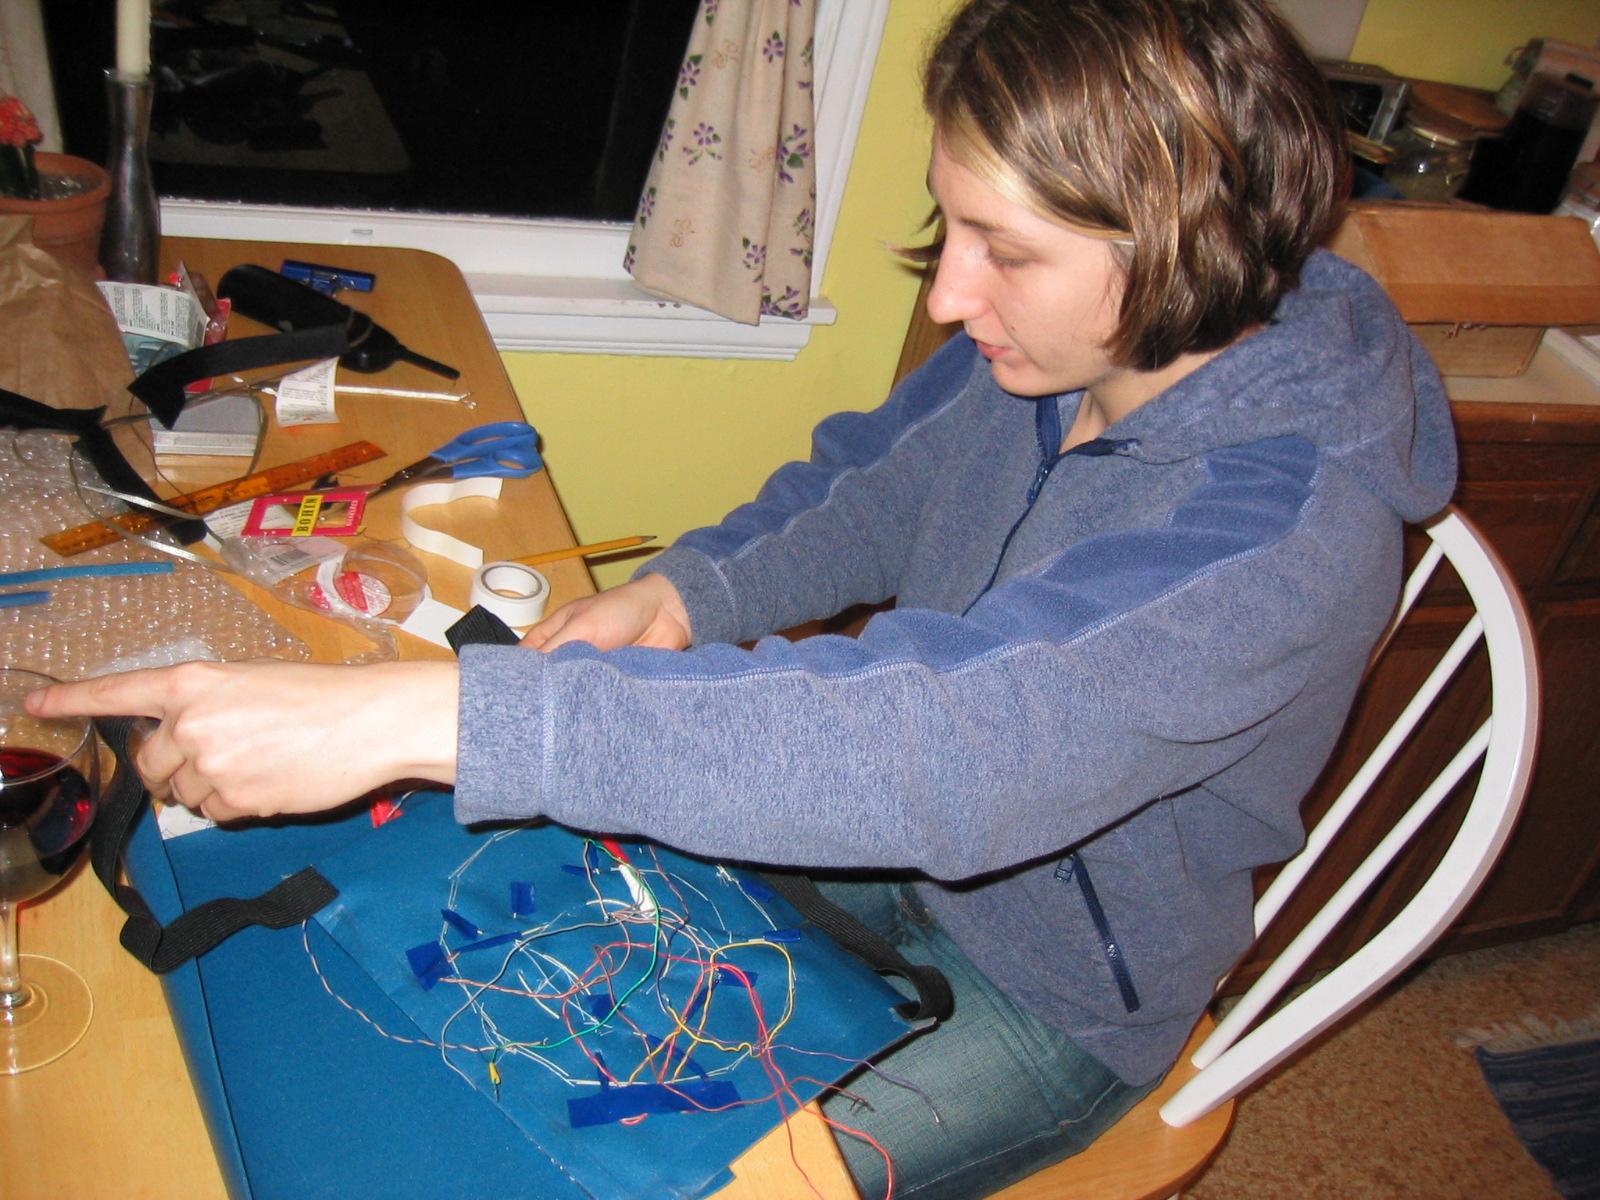 netanya sewing straps